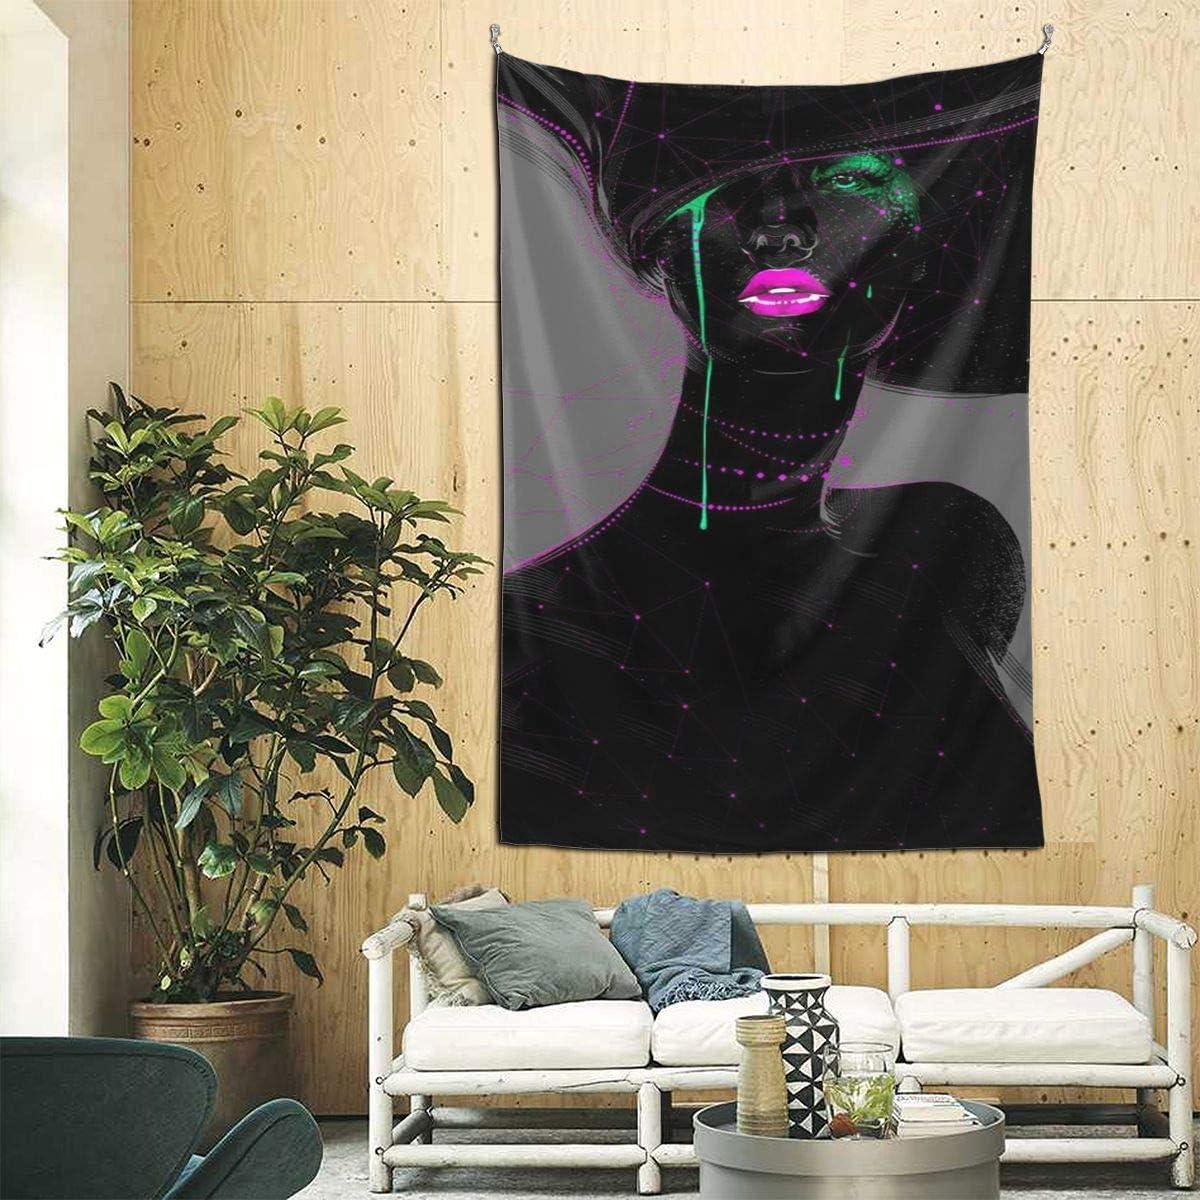 Exclusive Home Curtains Belgian Textured Linen Look Jacquard Sheer Grommet Top Curtain Panel Pair, 50×96, Snowflake